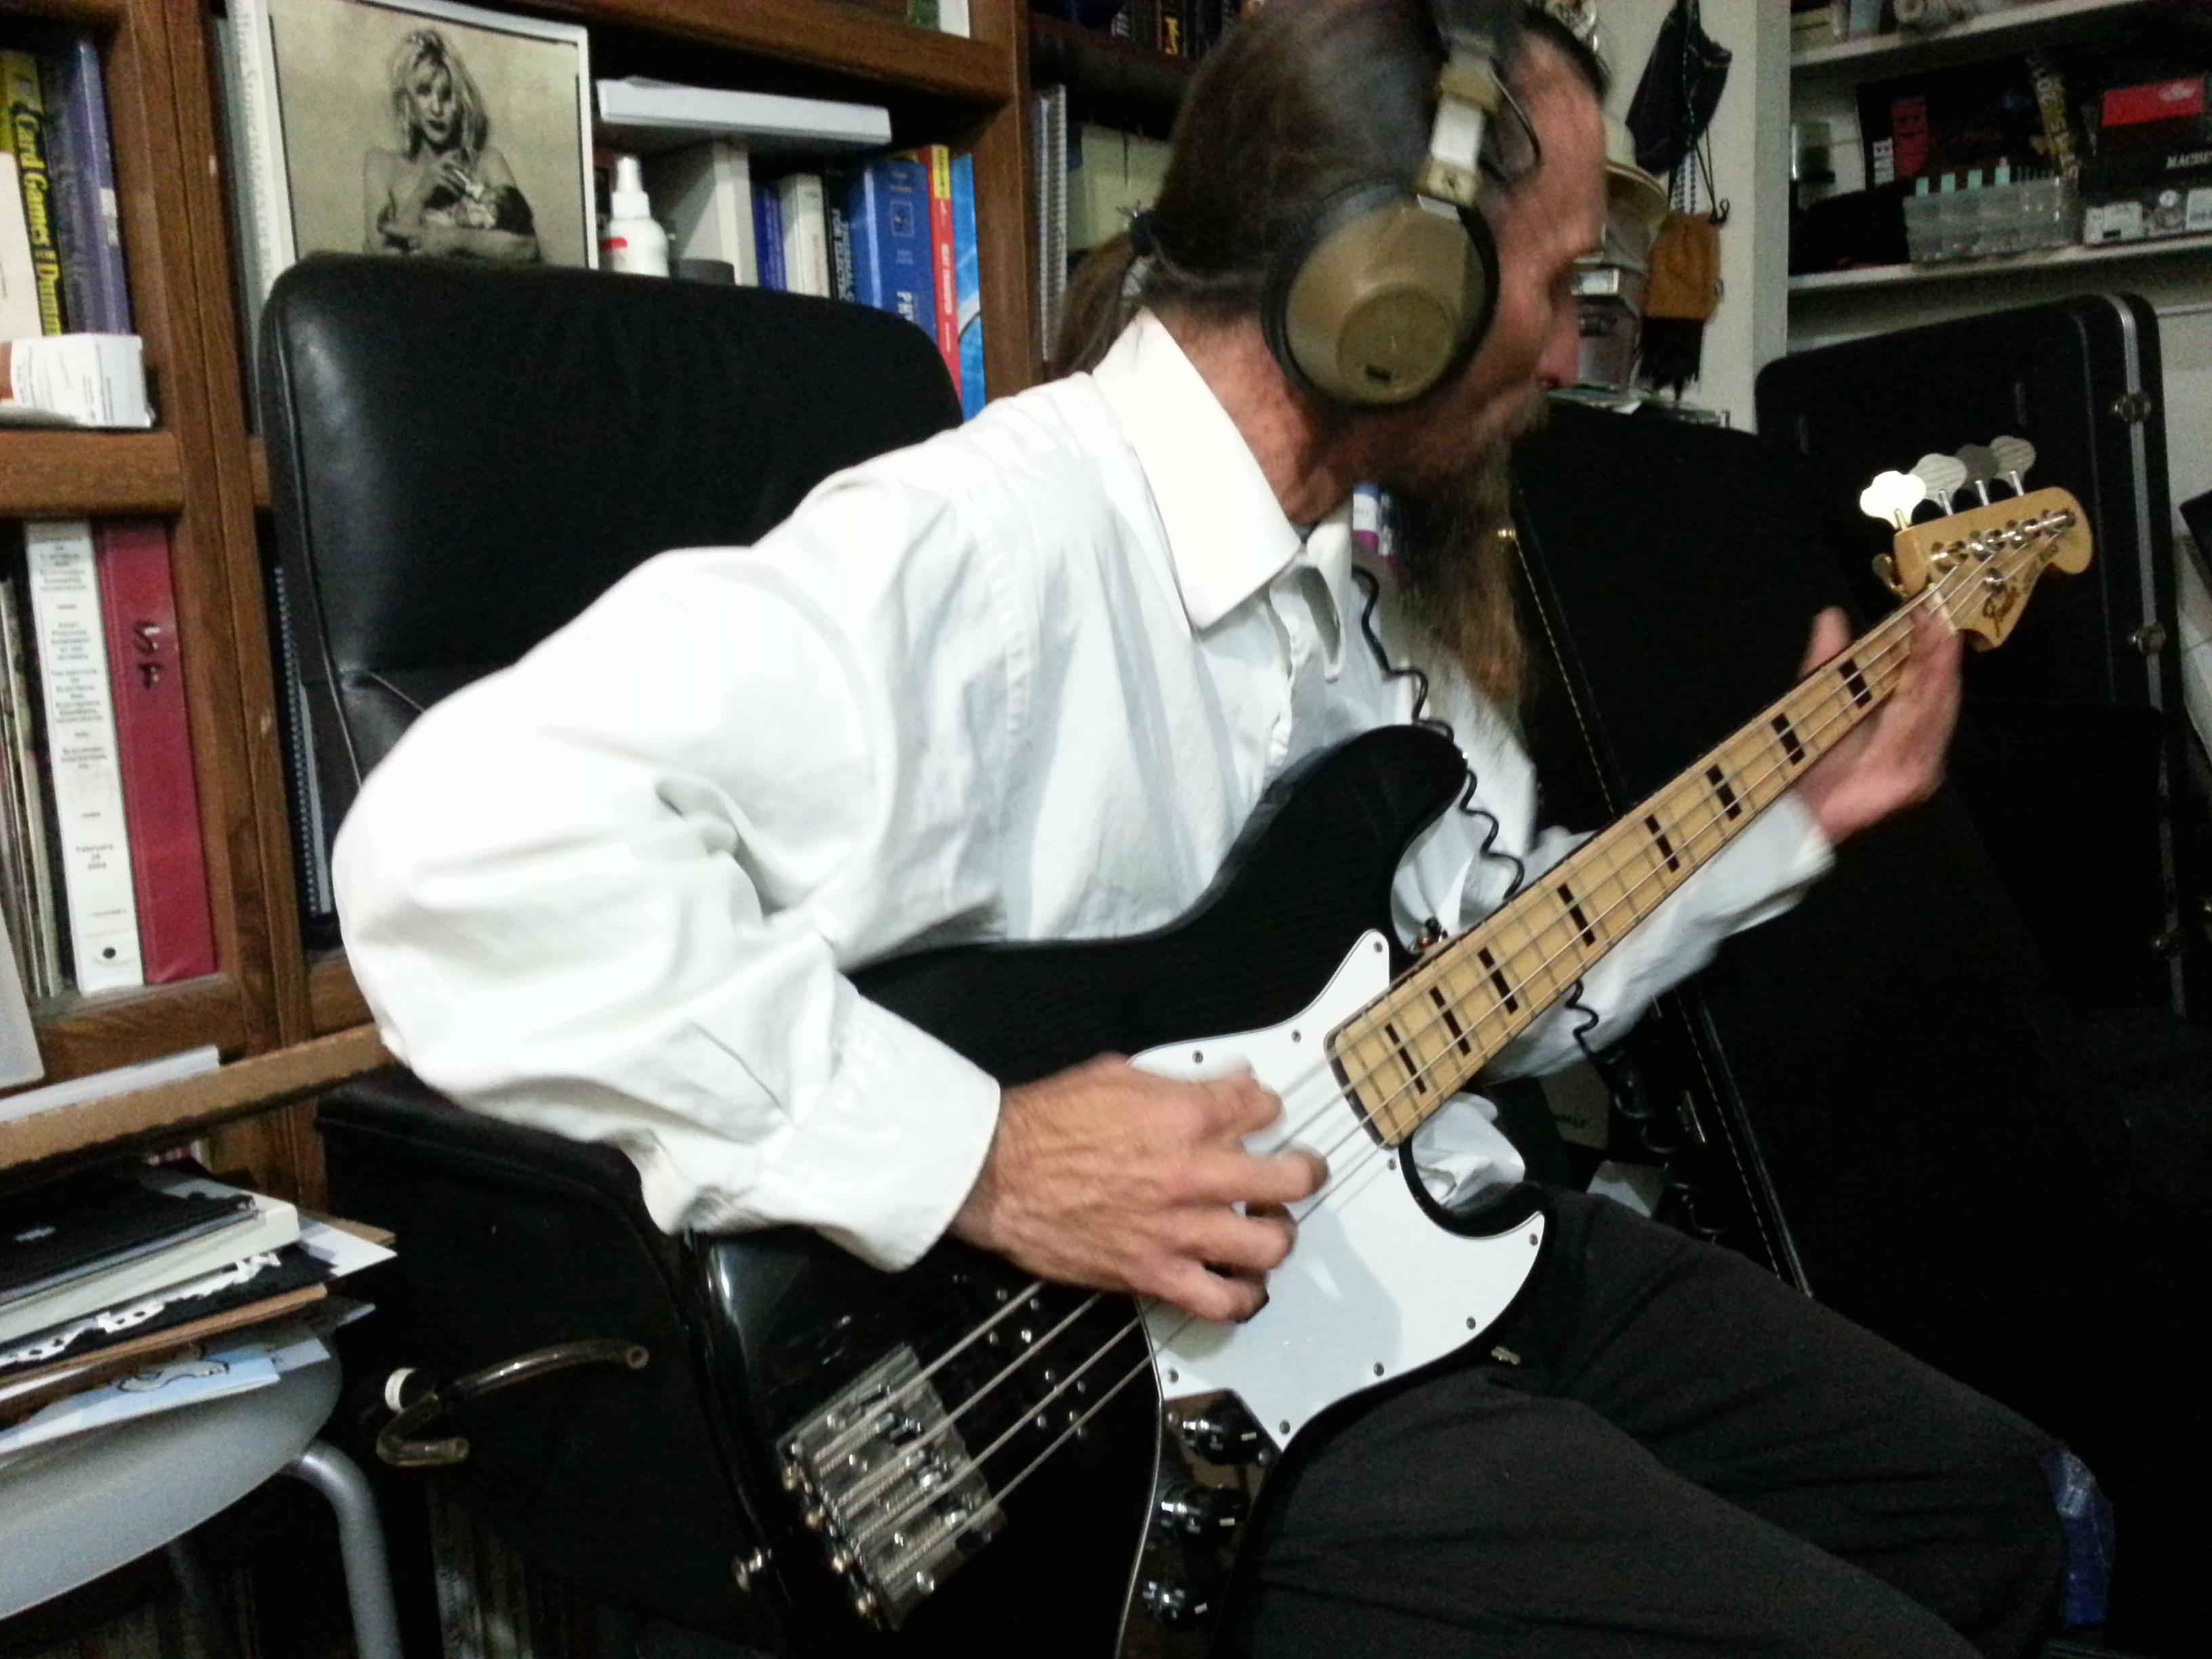 Ryan recording